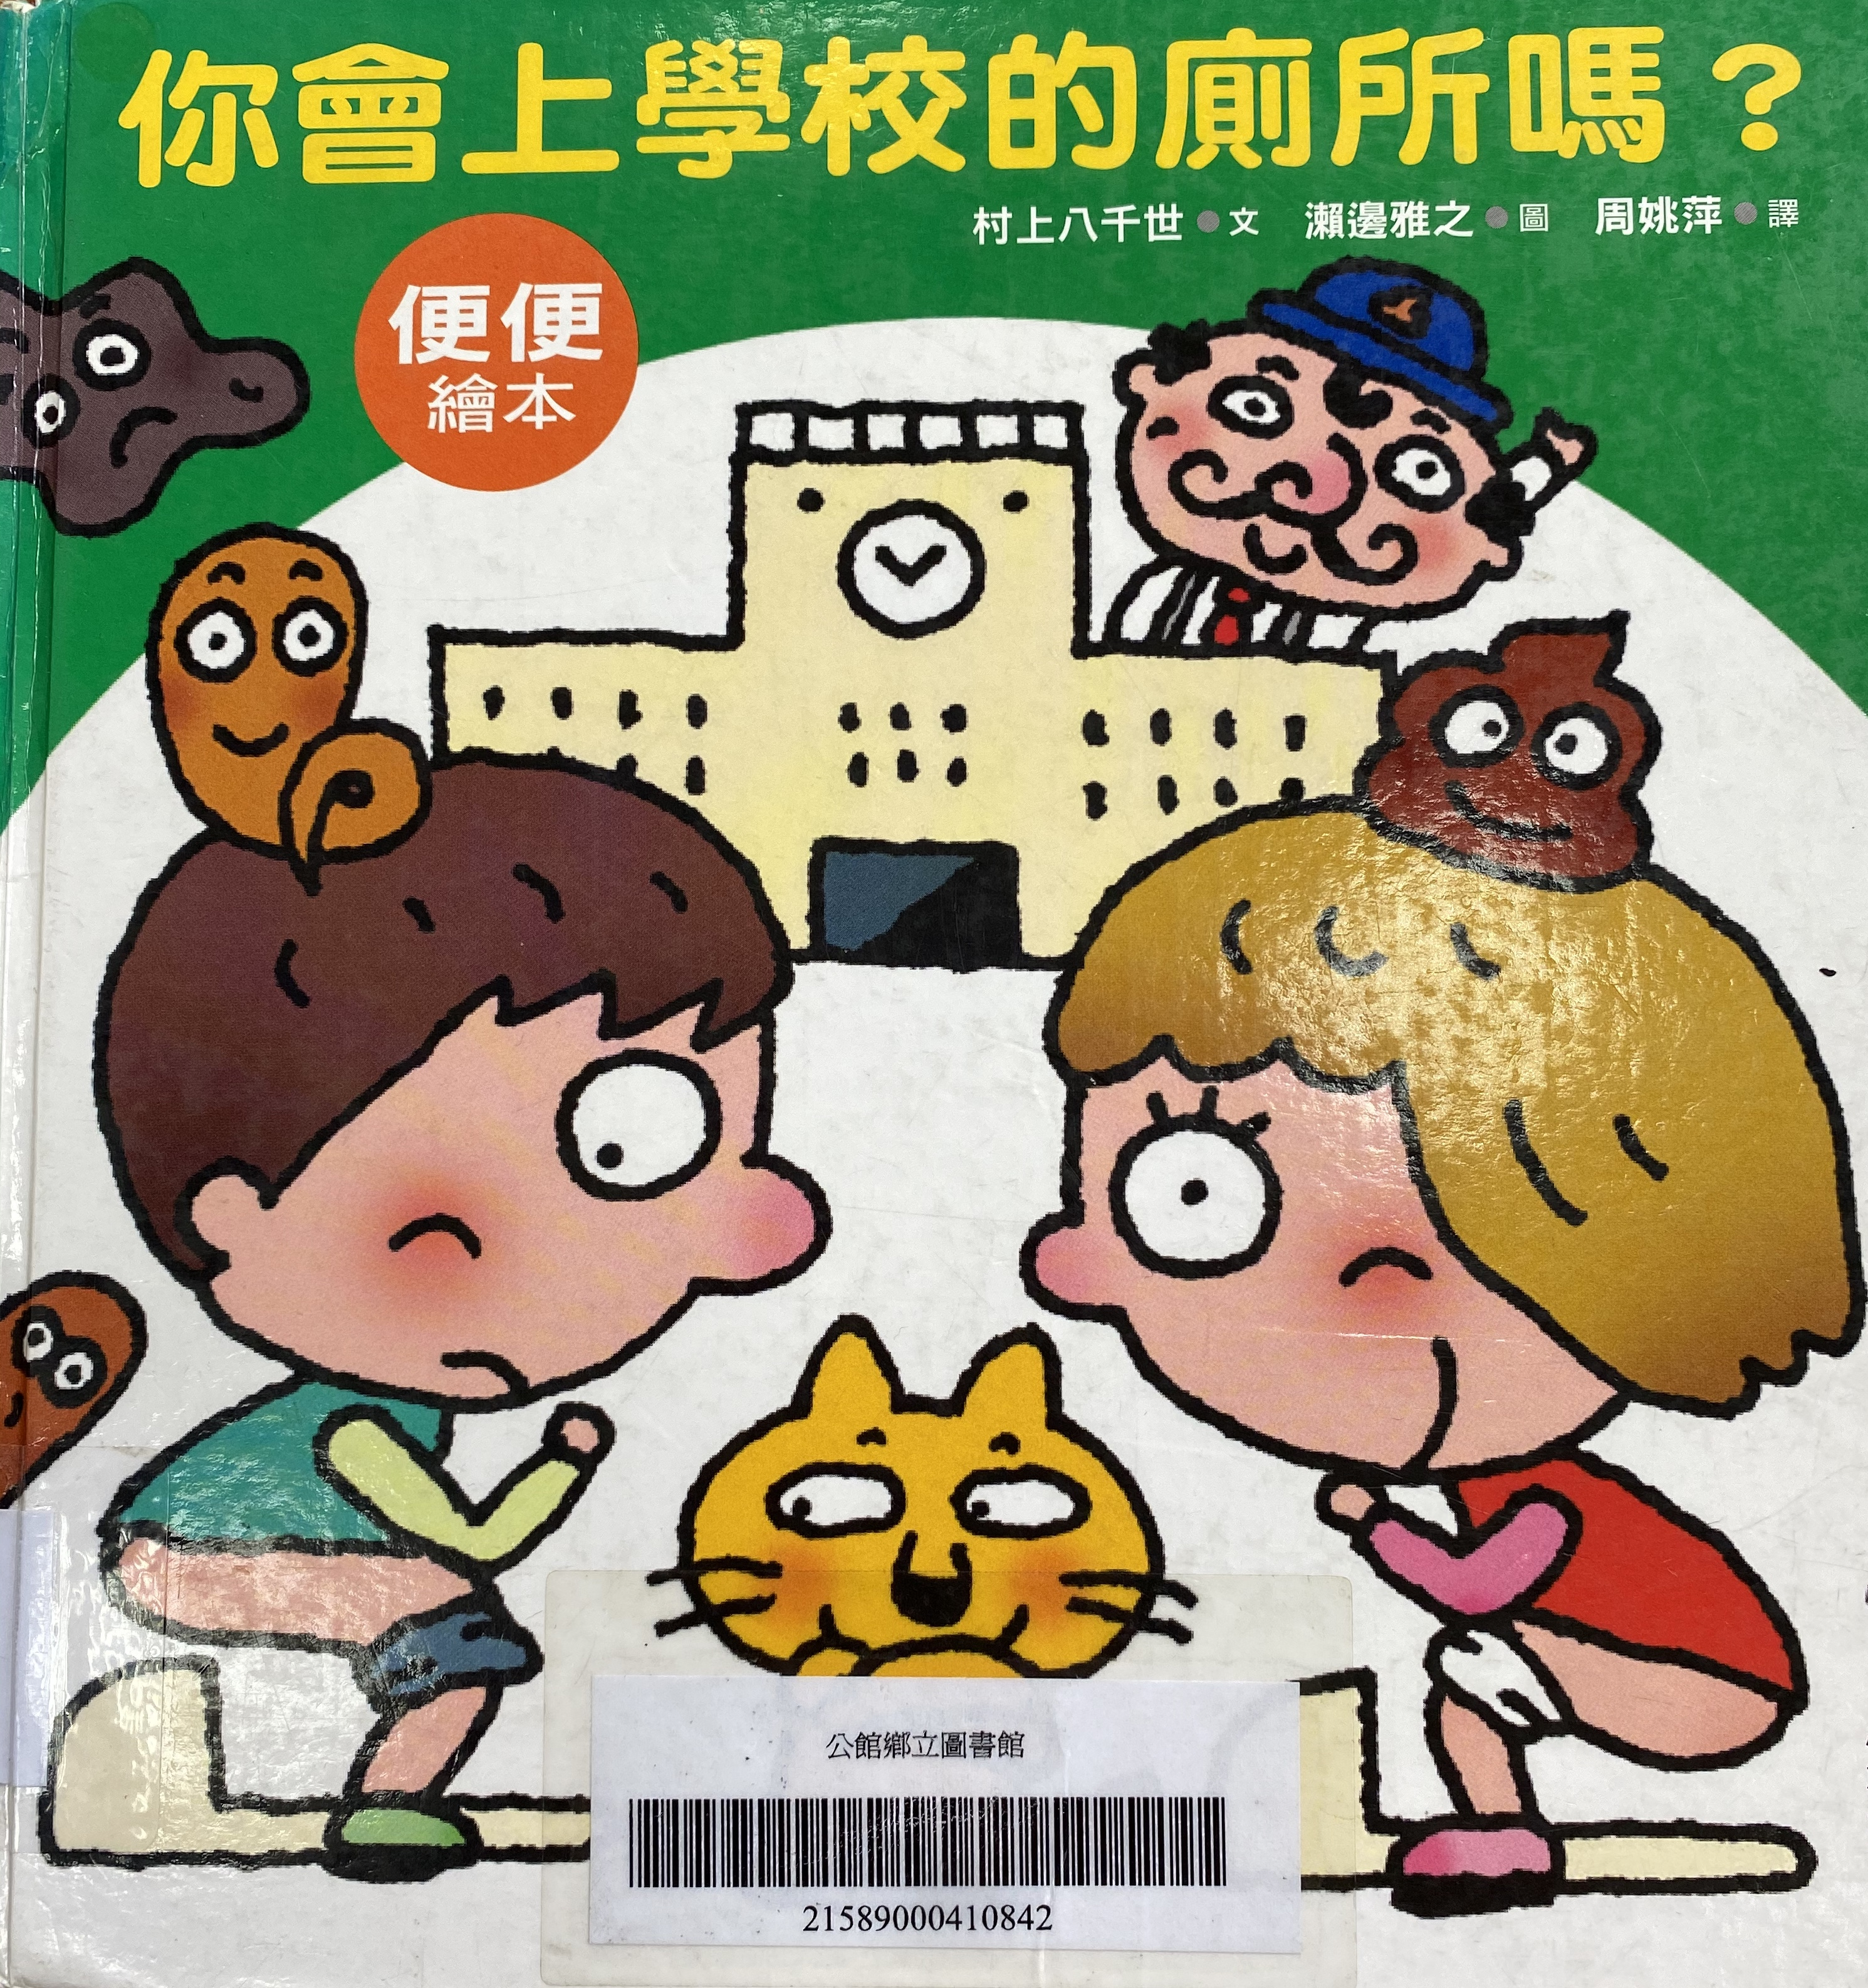 S2-065/ 你會上學校的廁所嗎?/ 村上八千世/ 小魯文化